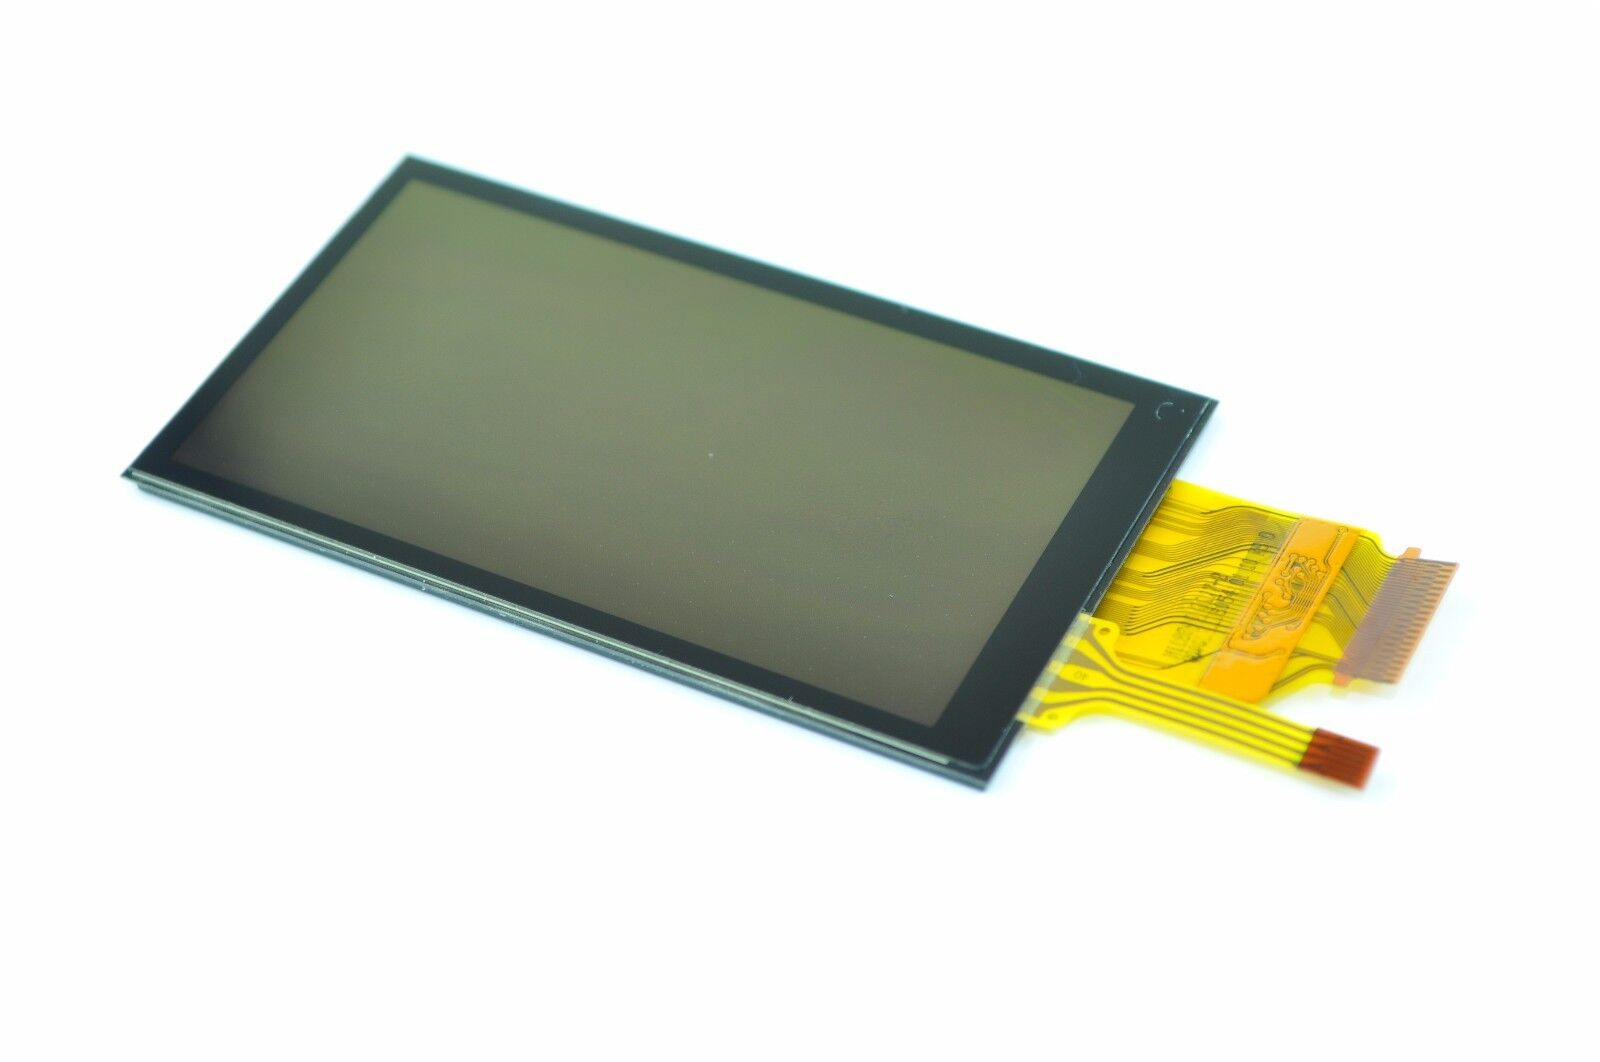 Sony Hdr-cx210 Cx250 Cx260 Cx270 Cx390 Lcd Screen Display...